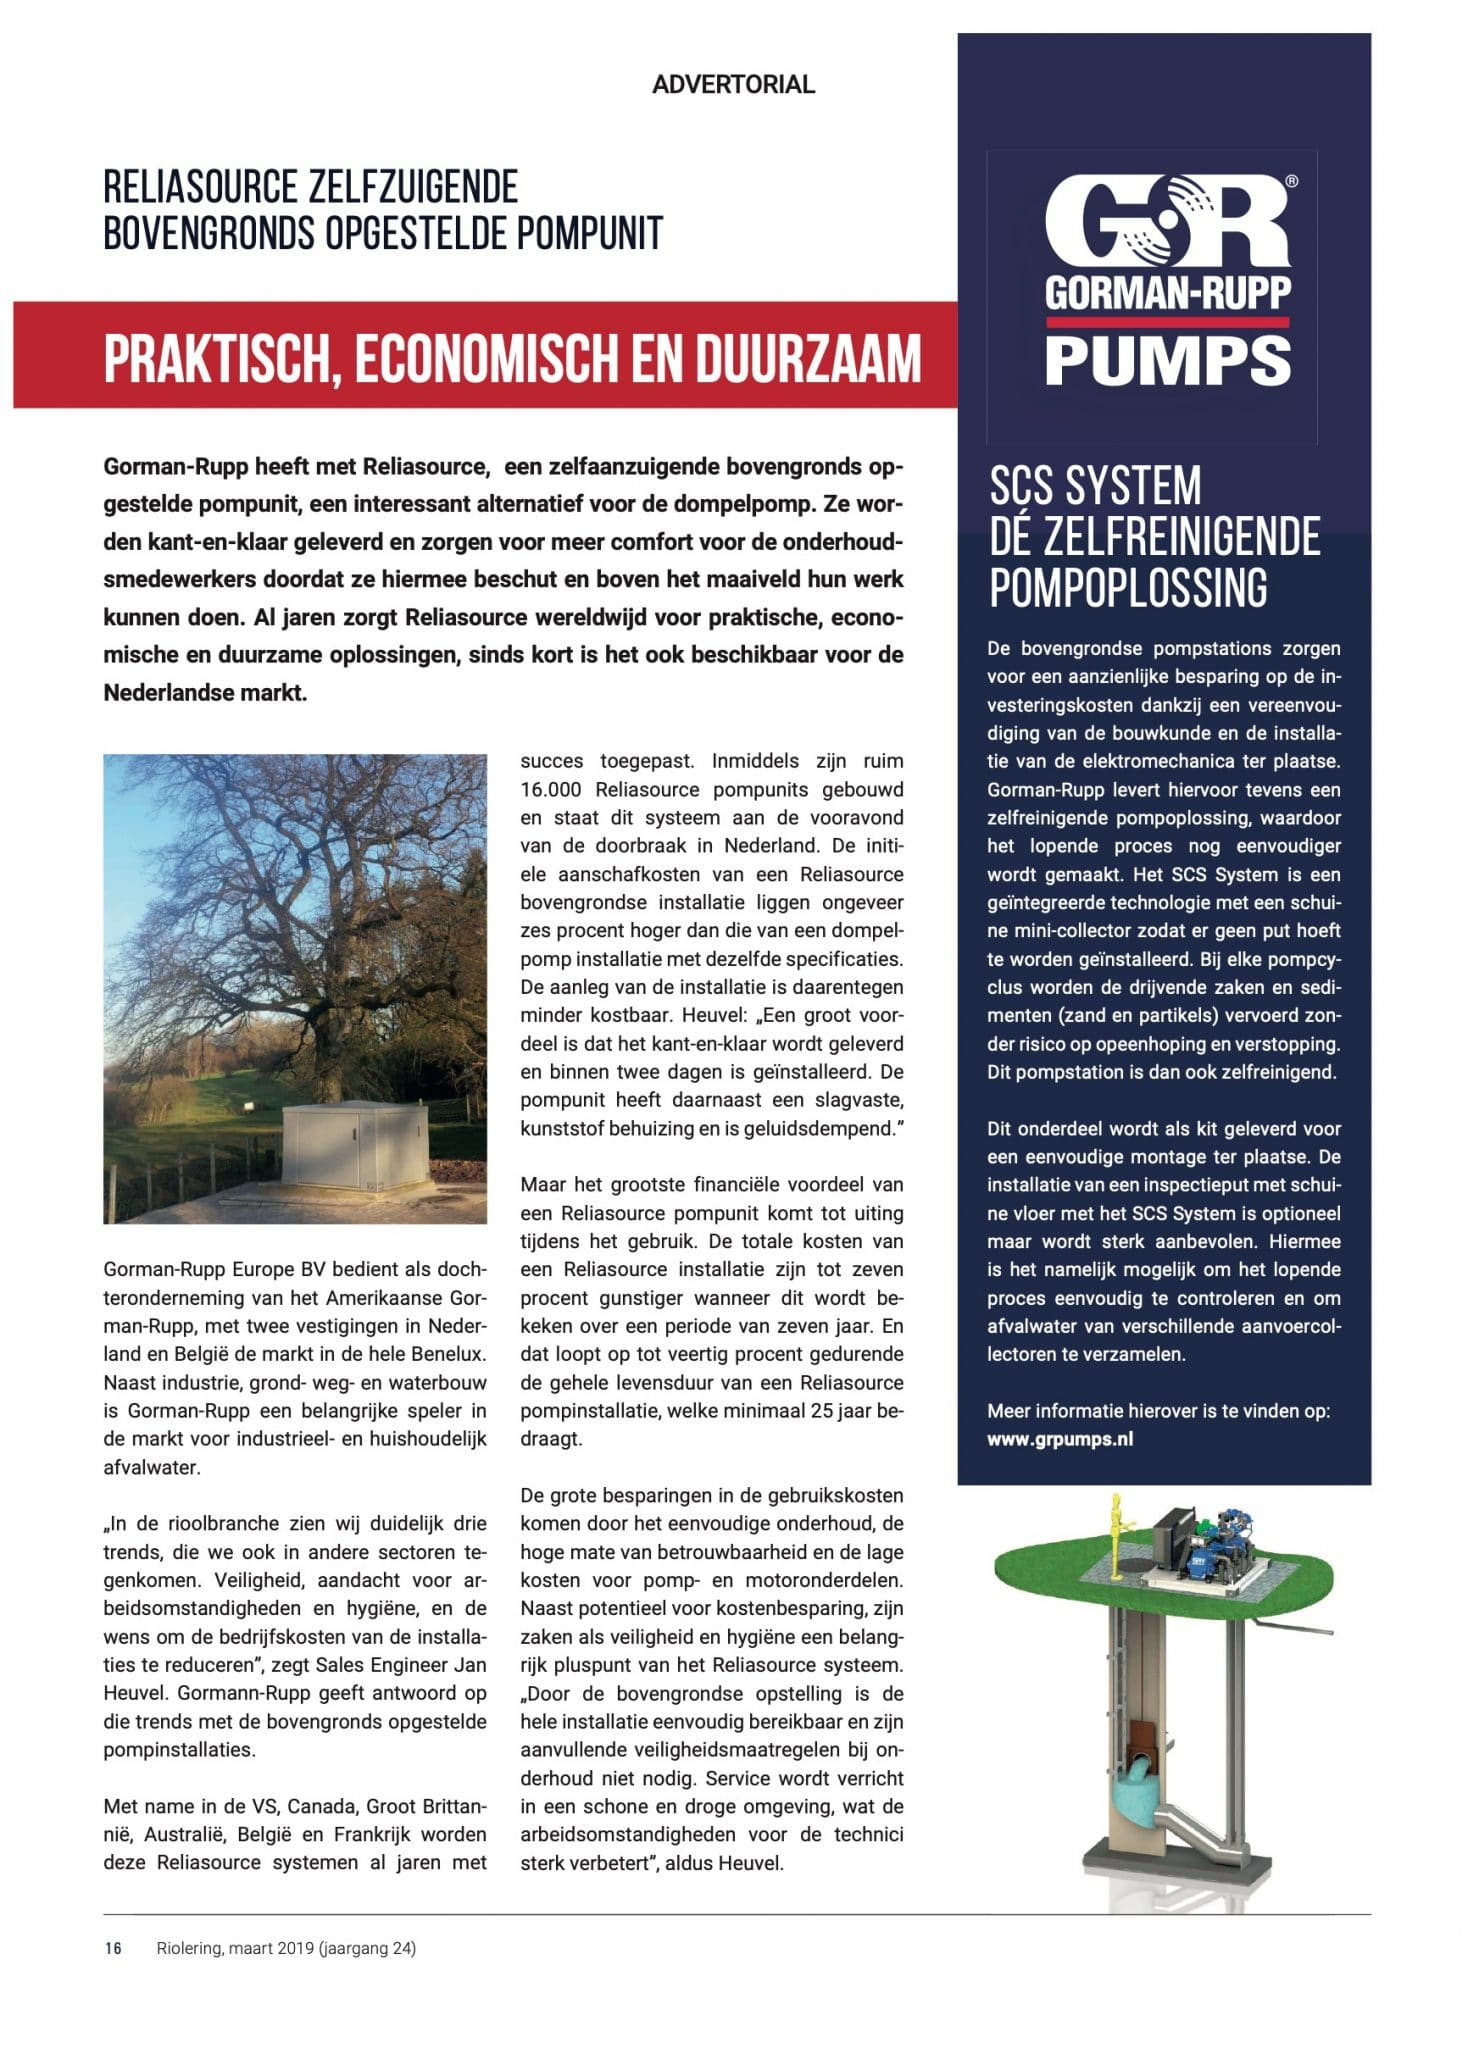 12-GR-pumps 2